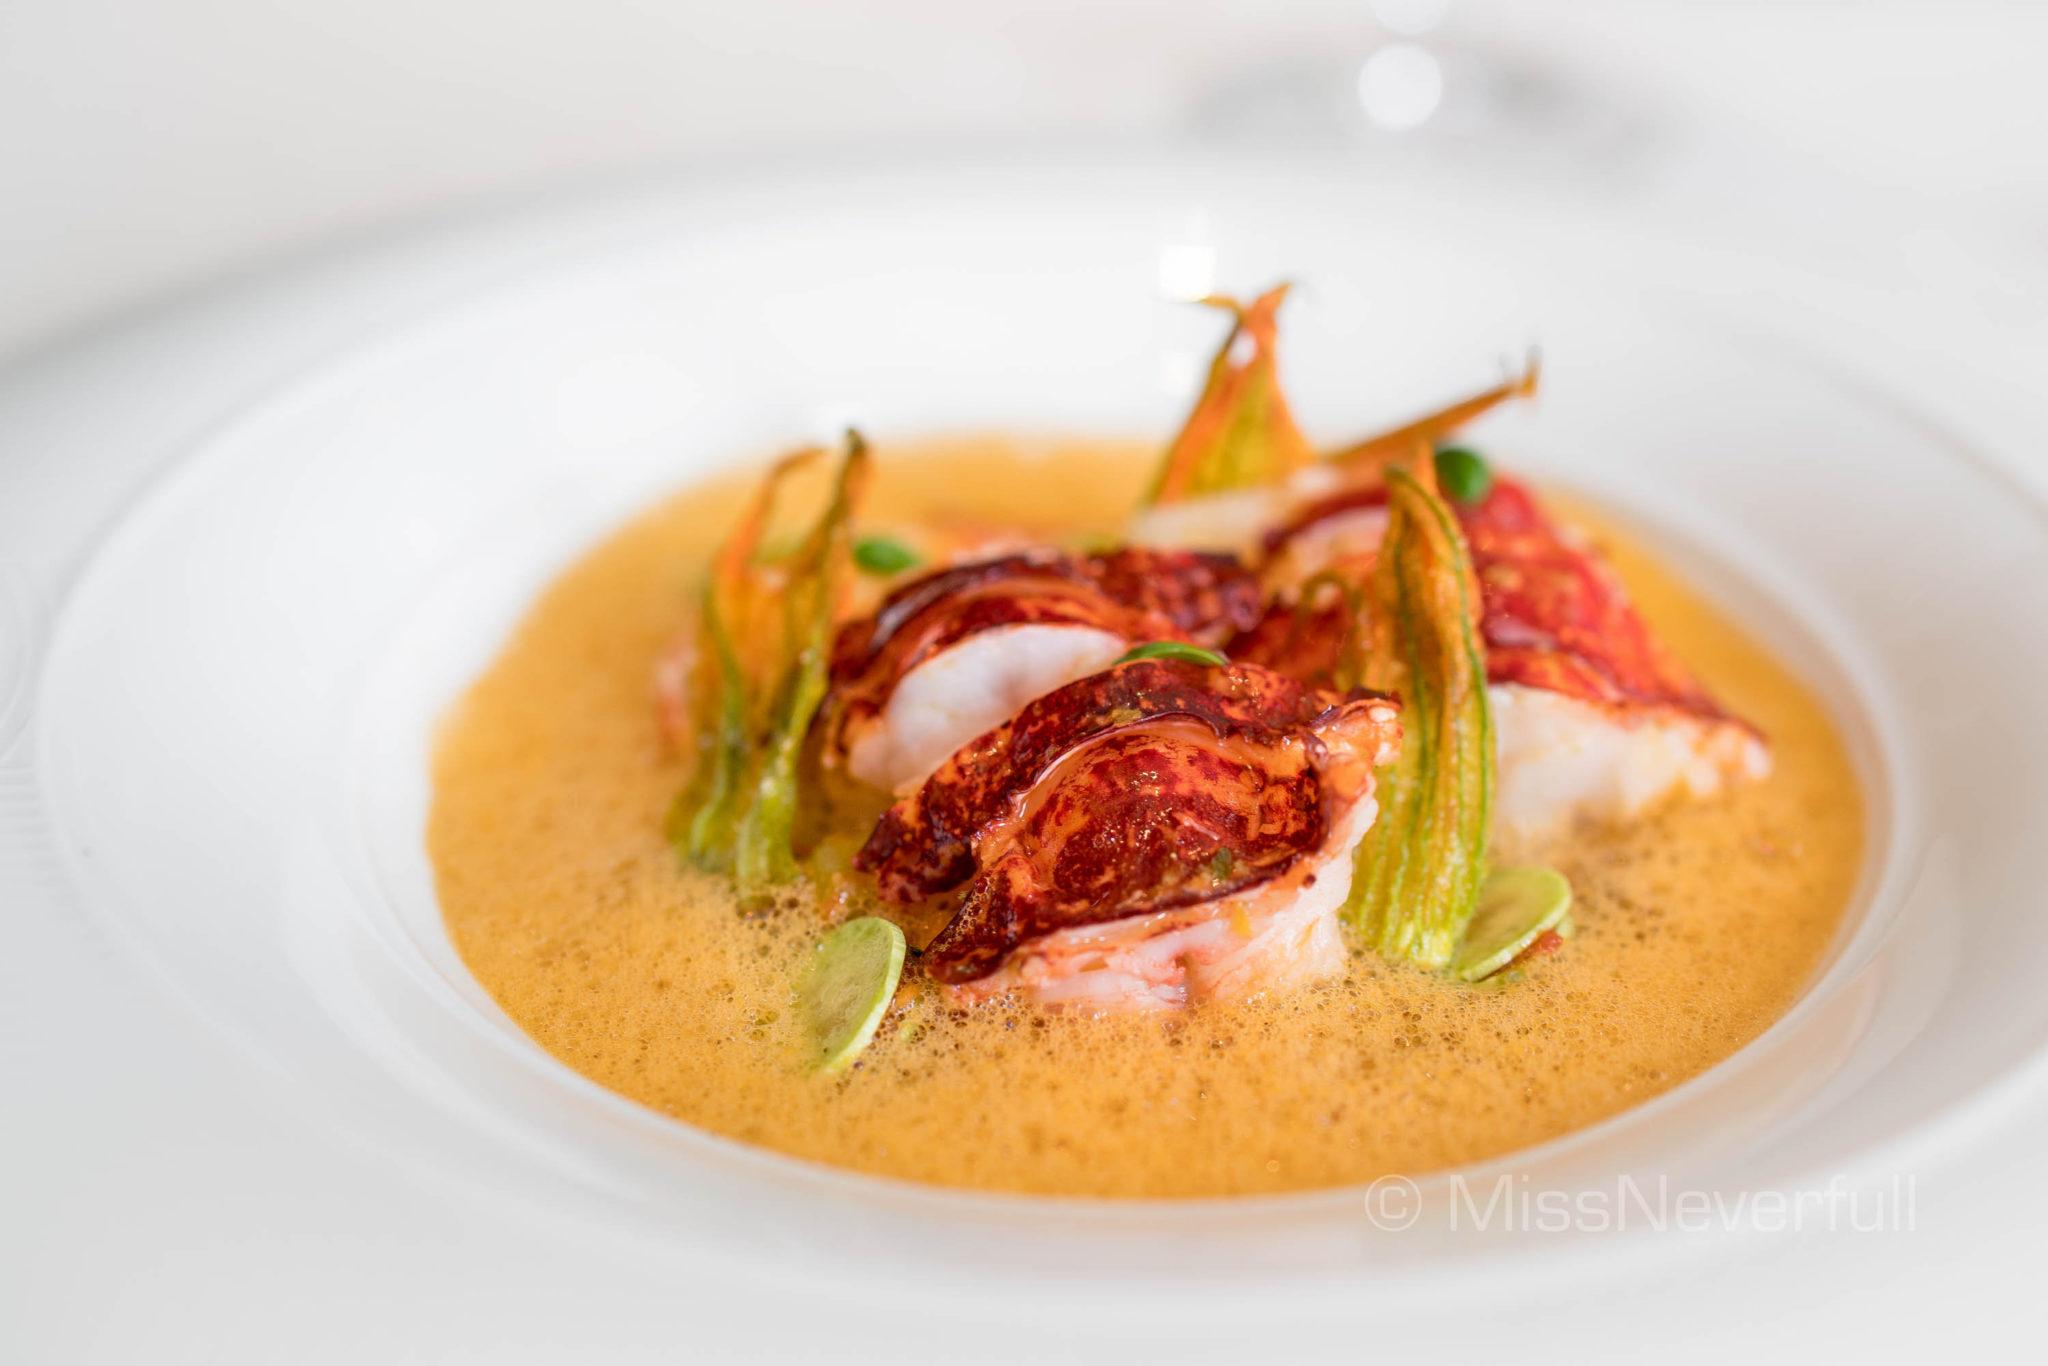 Brittany Blue Lobster (HK$520)